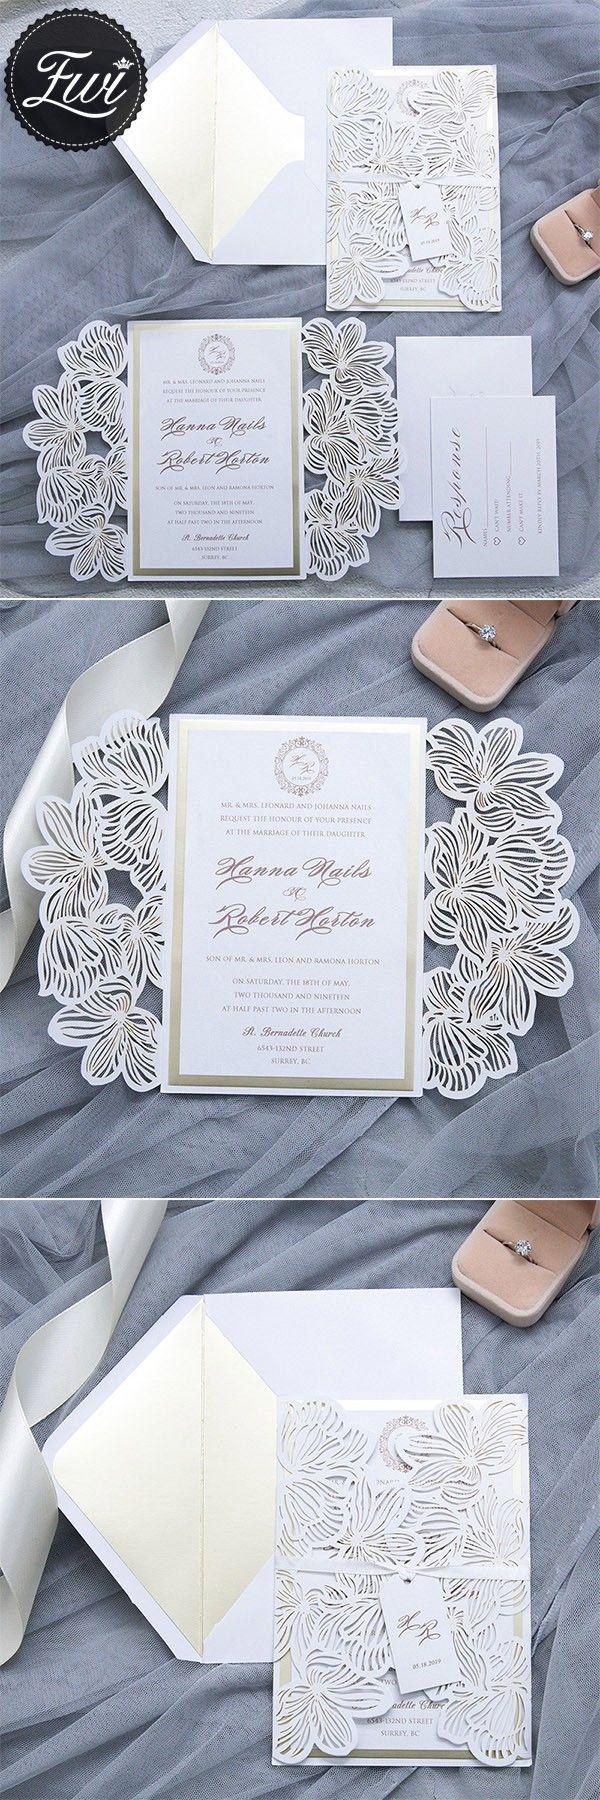 Best 200+ Wedding Invitations images on Pinterest